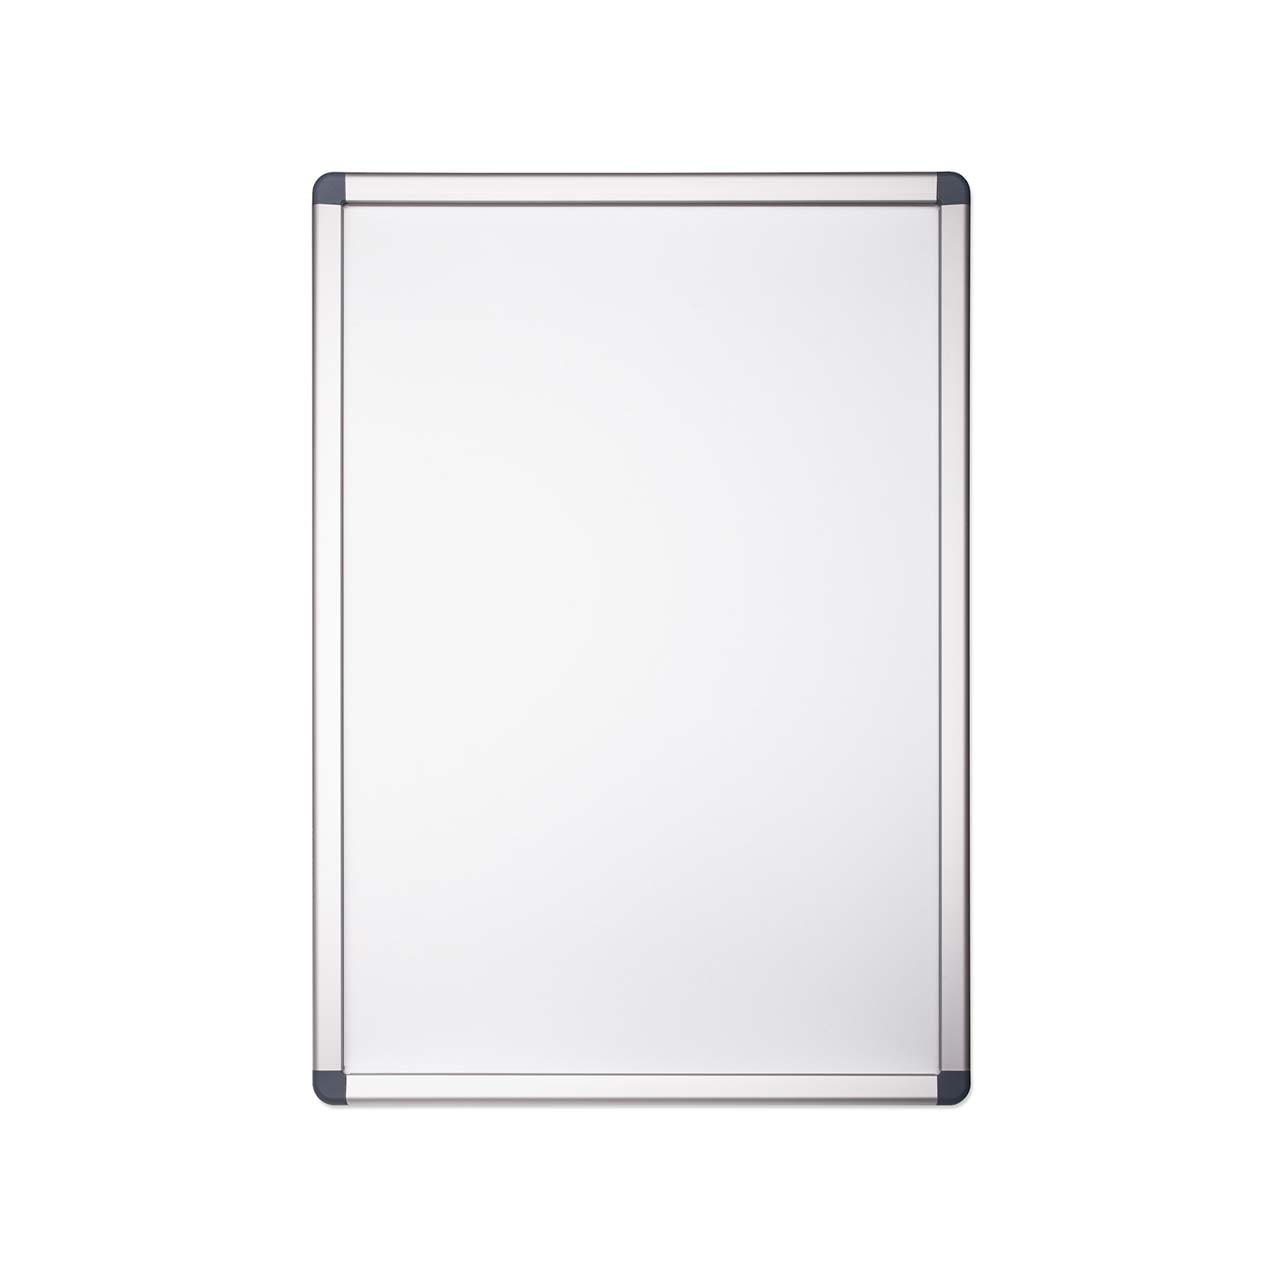 Alu-Plakatrahmen 700 x 1000 mm (DIN B1)   Plakatrahmen DIN B1 (700 x ...